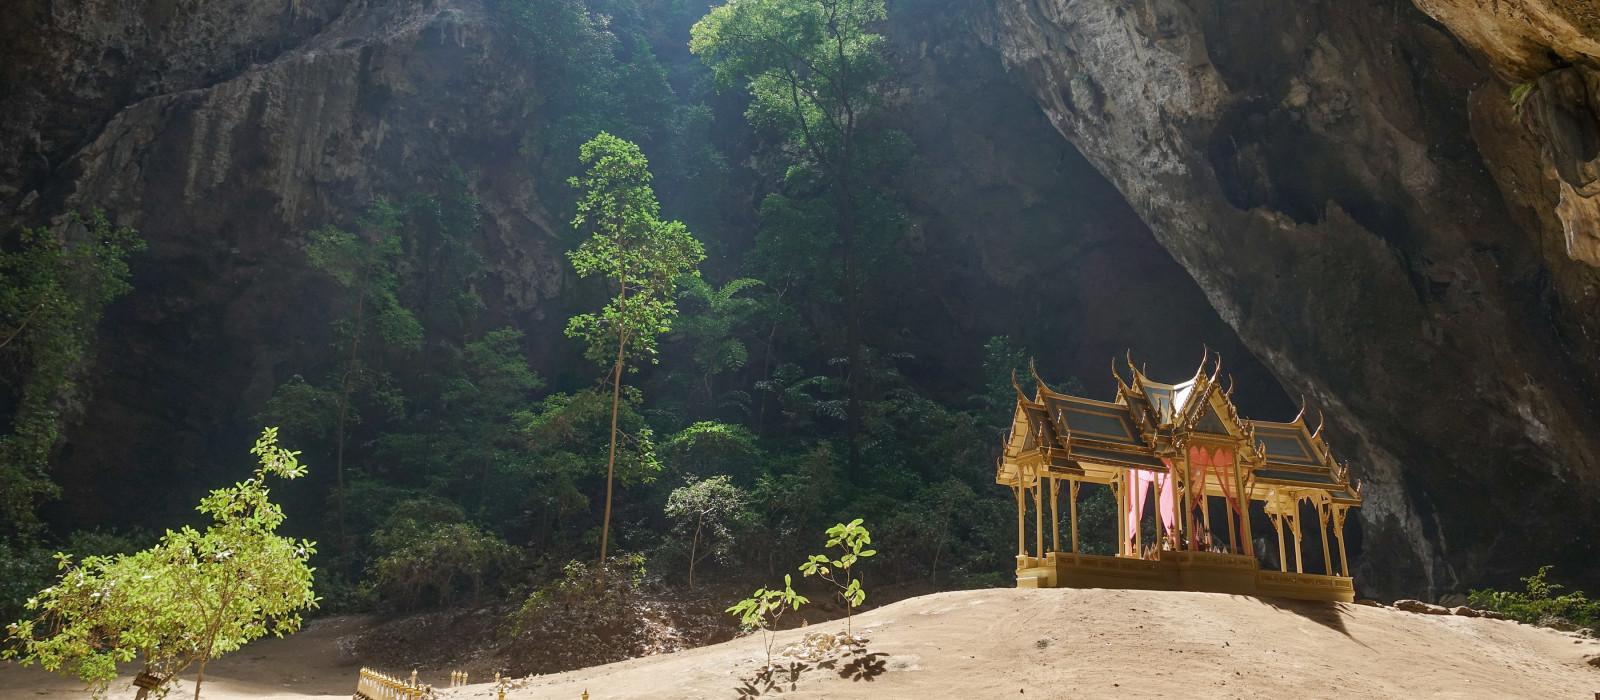 Pavillon in der Phraya Nakorn Höhle nahe Hua Hin, Thailand